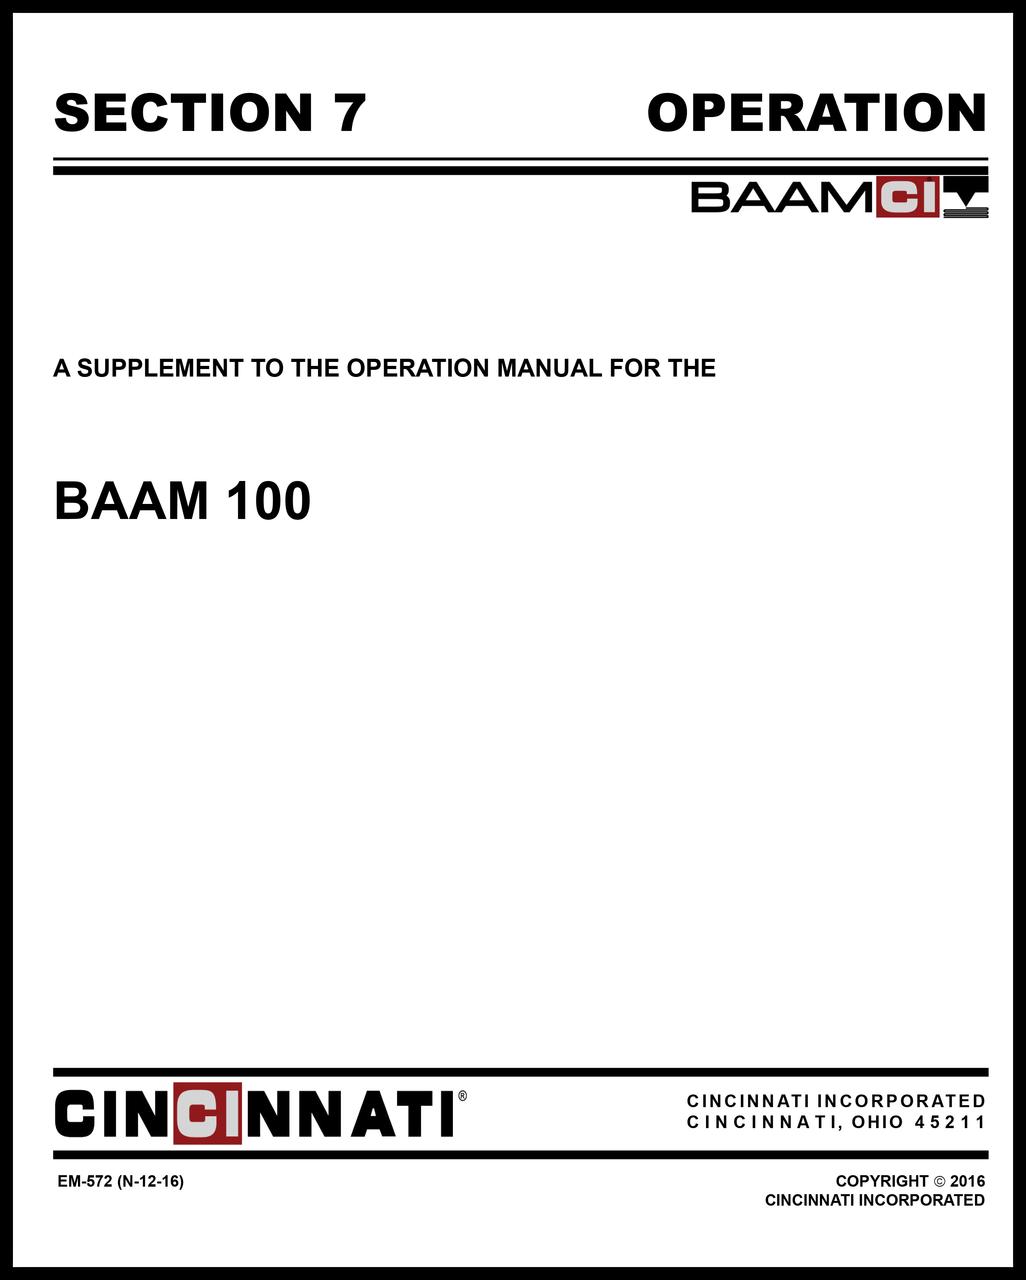 EM-572 (N-12-16) BAAM 100_Section 7_Supplement Manual